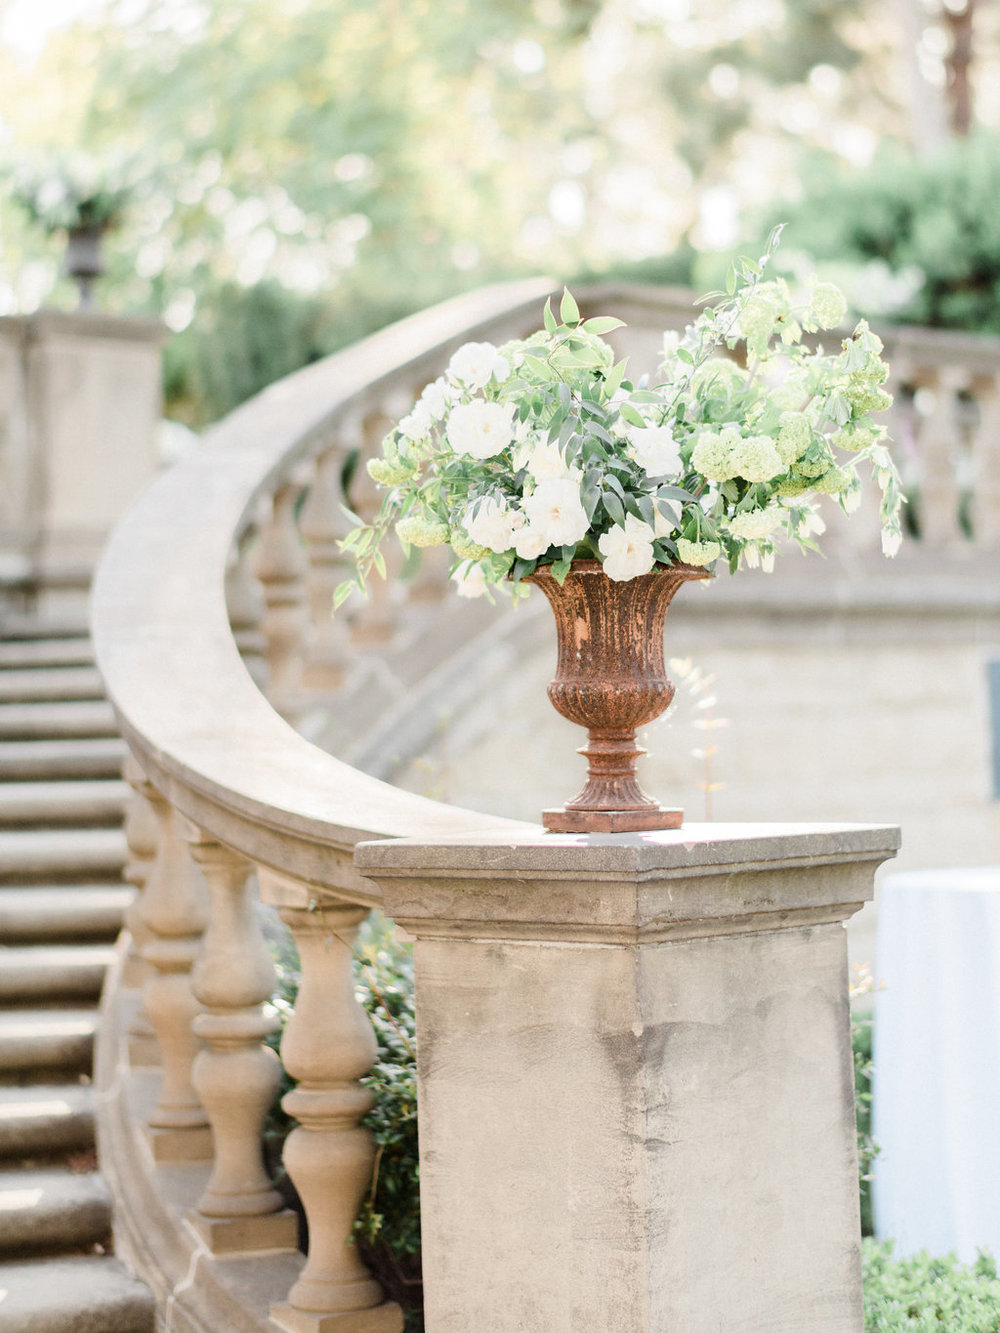 linajaandmichael-wedding-966.jpg